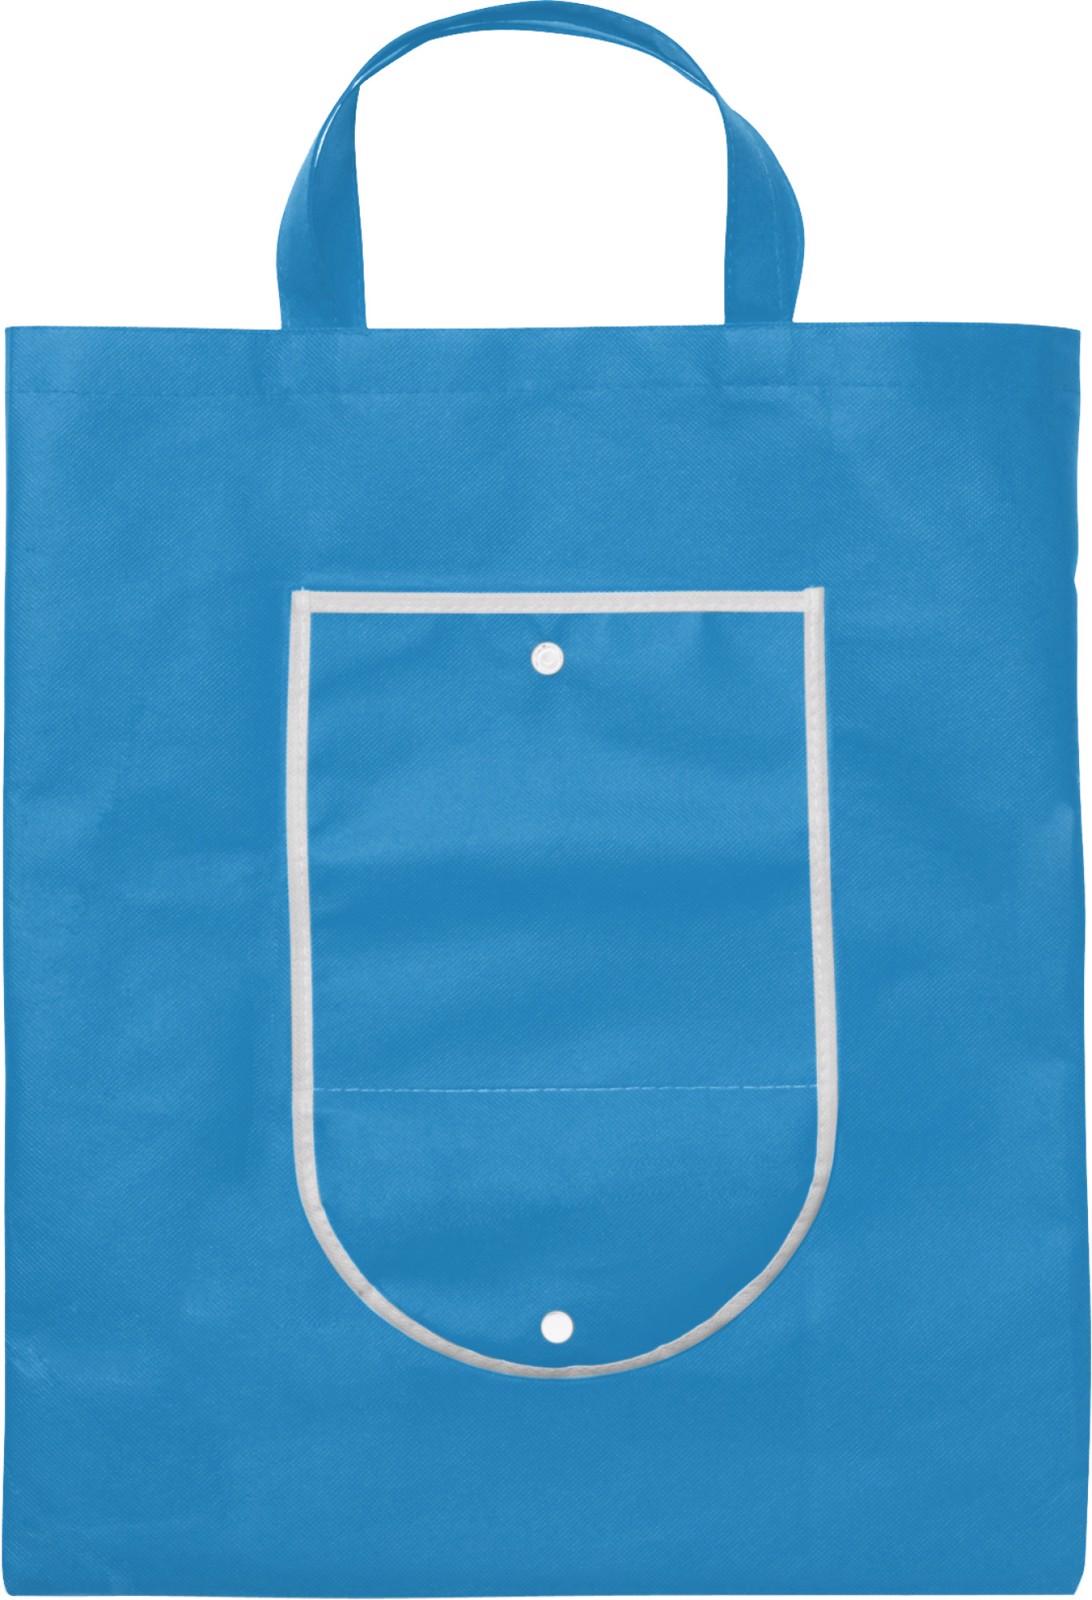 Nonwoven (80 g/m²) foldable shopping bag - Light Blue